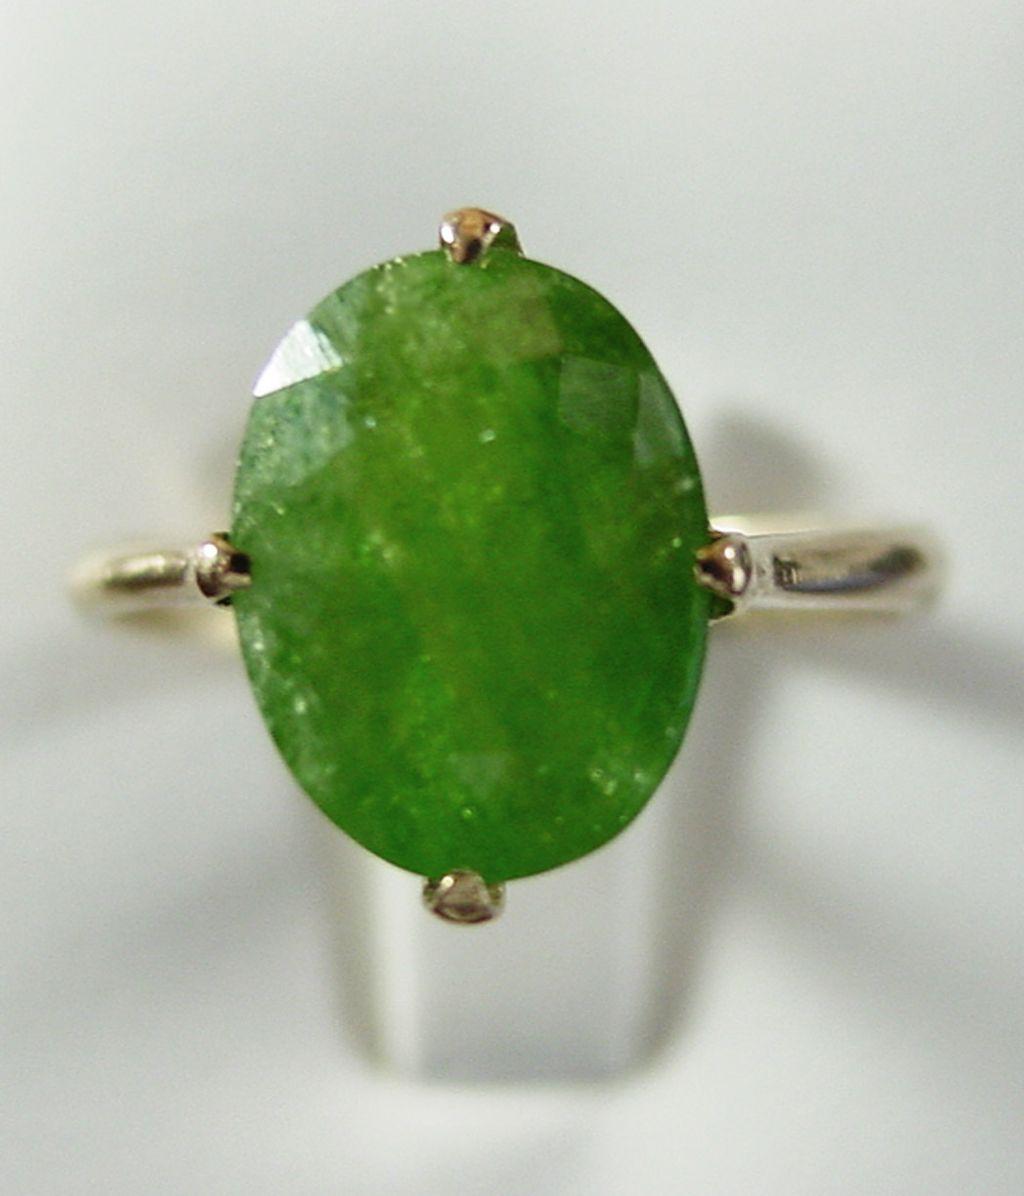 14K YG Demantoid Garnet Ring, Size 6 3/4